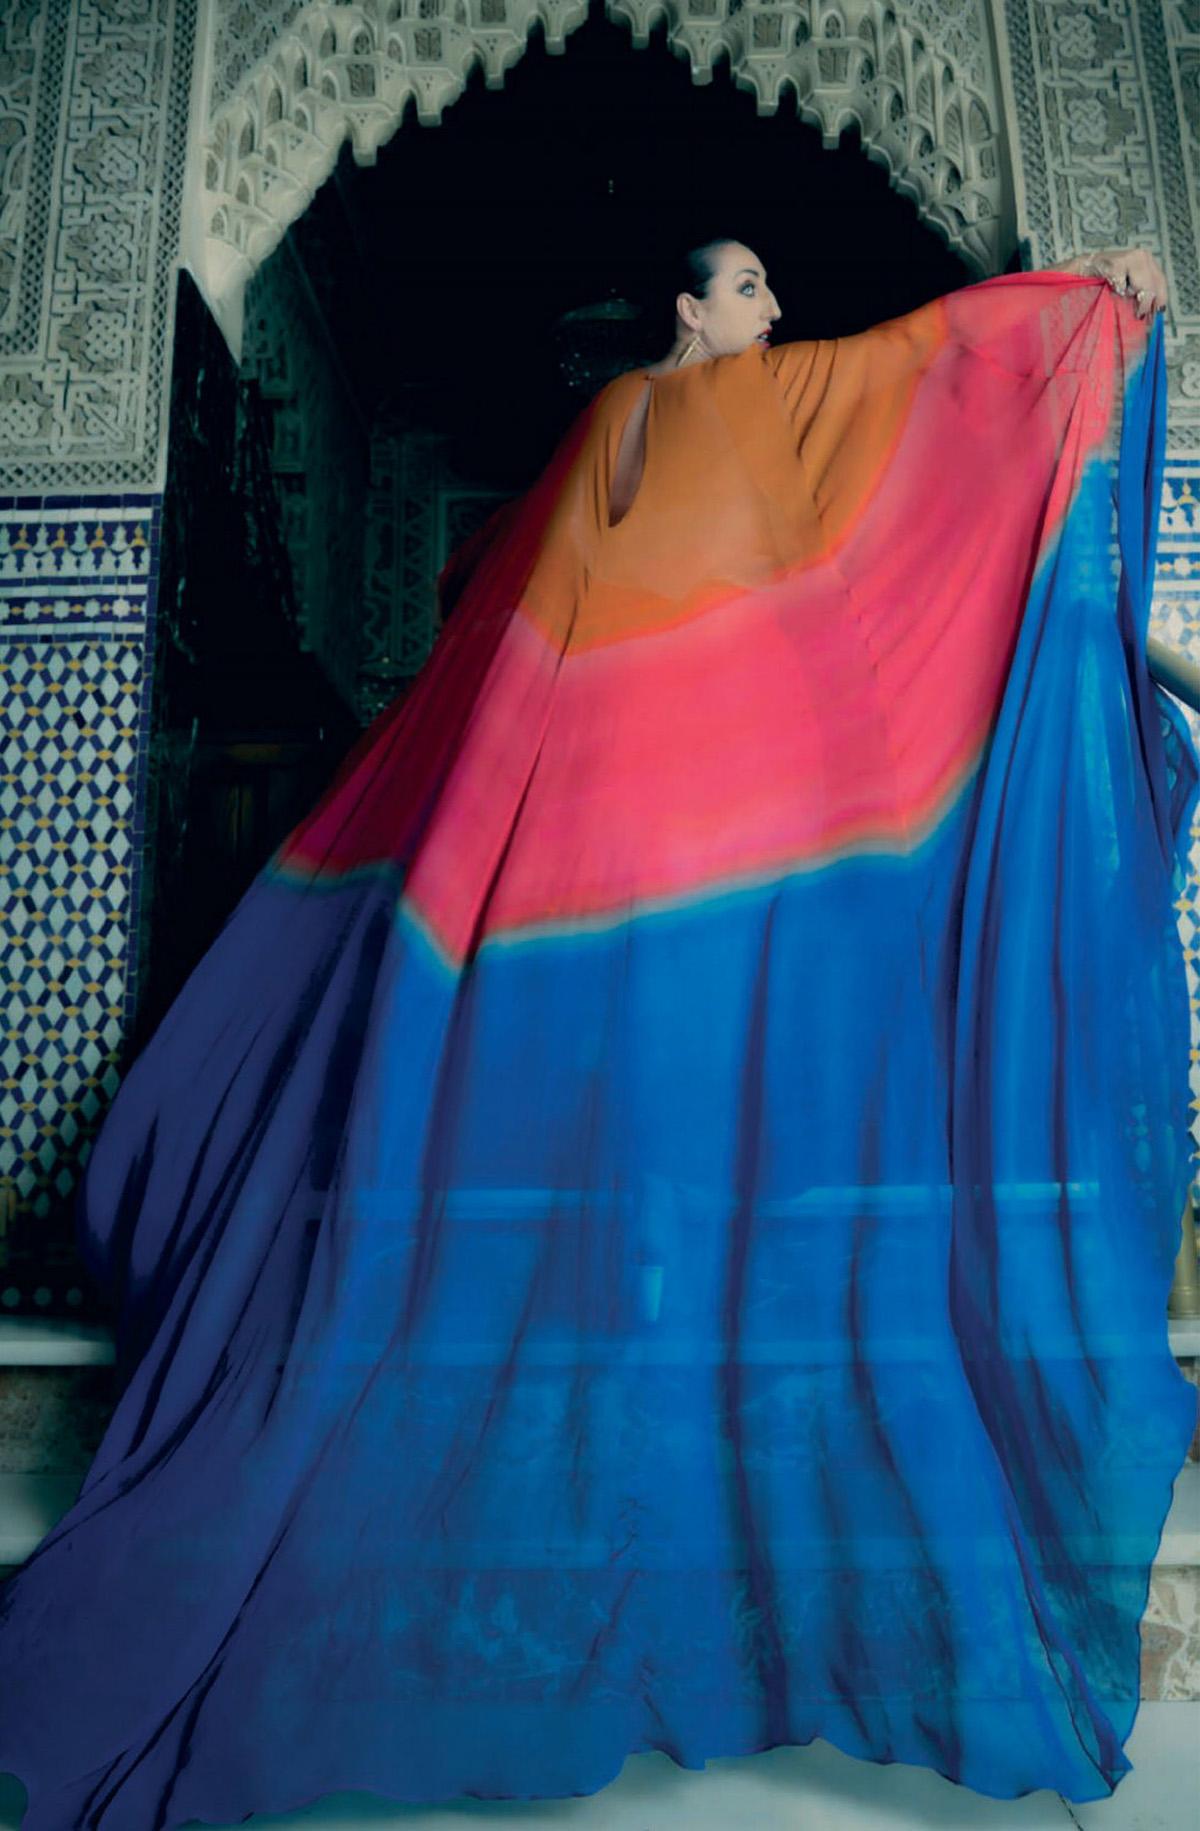 Rossy de Palma by Javier Biosca for Harper's Bazaar Spain September 2021